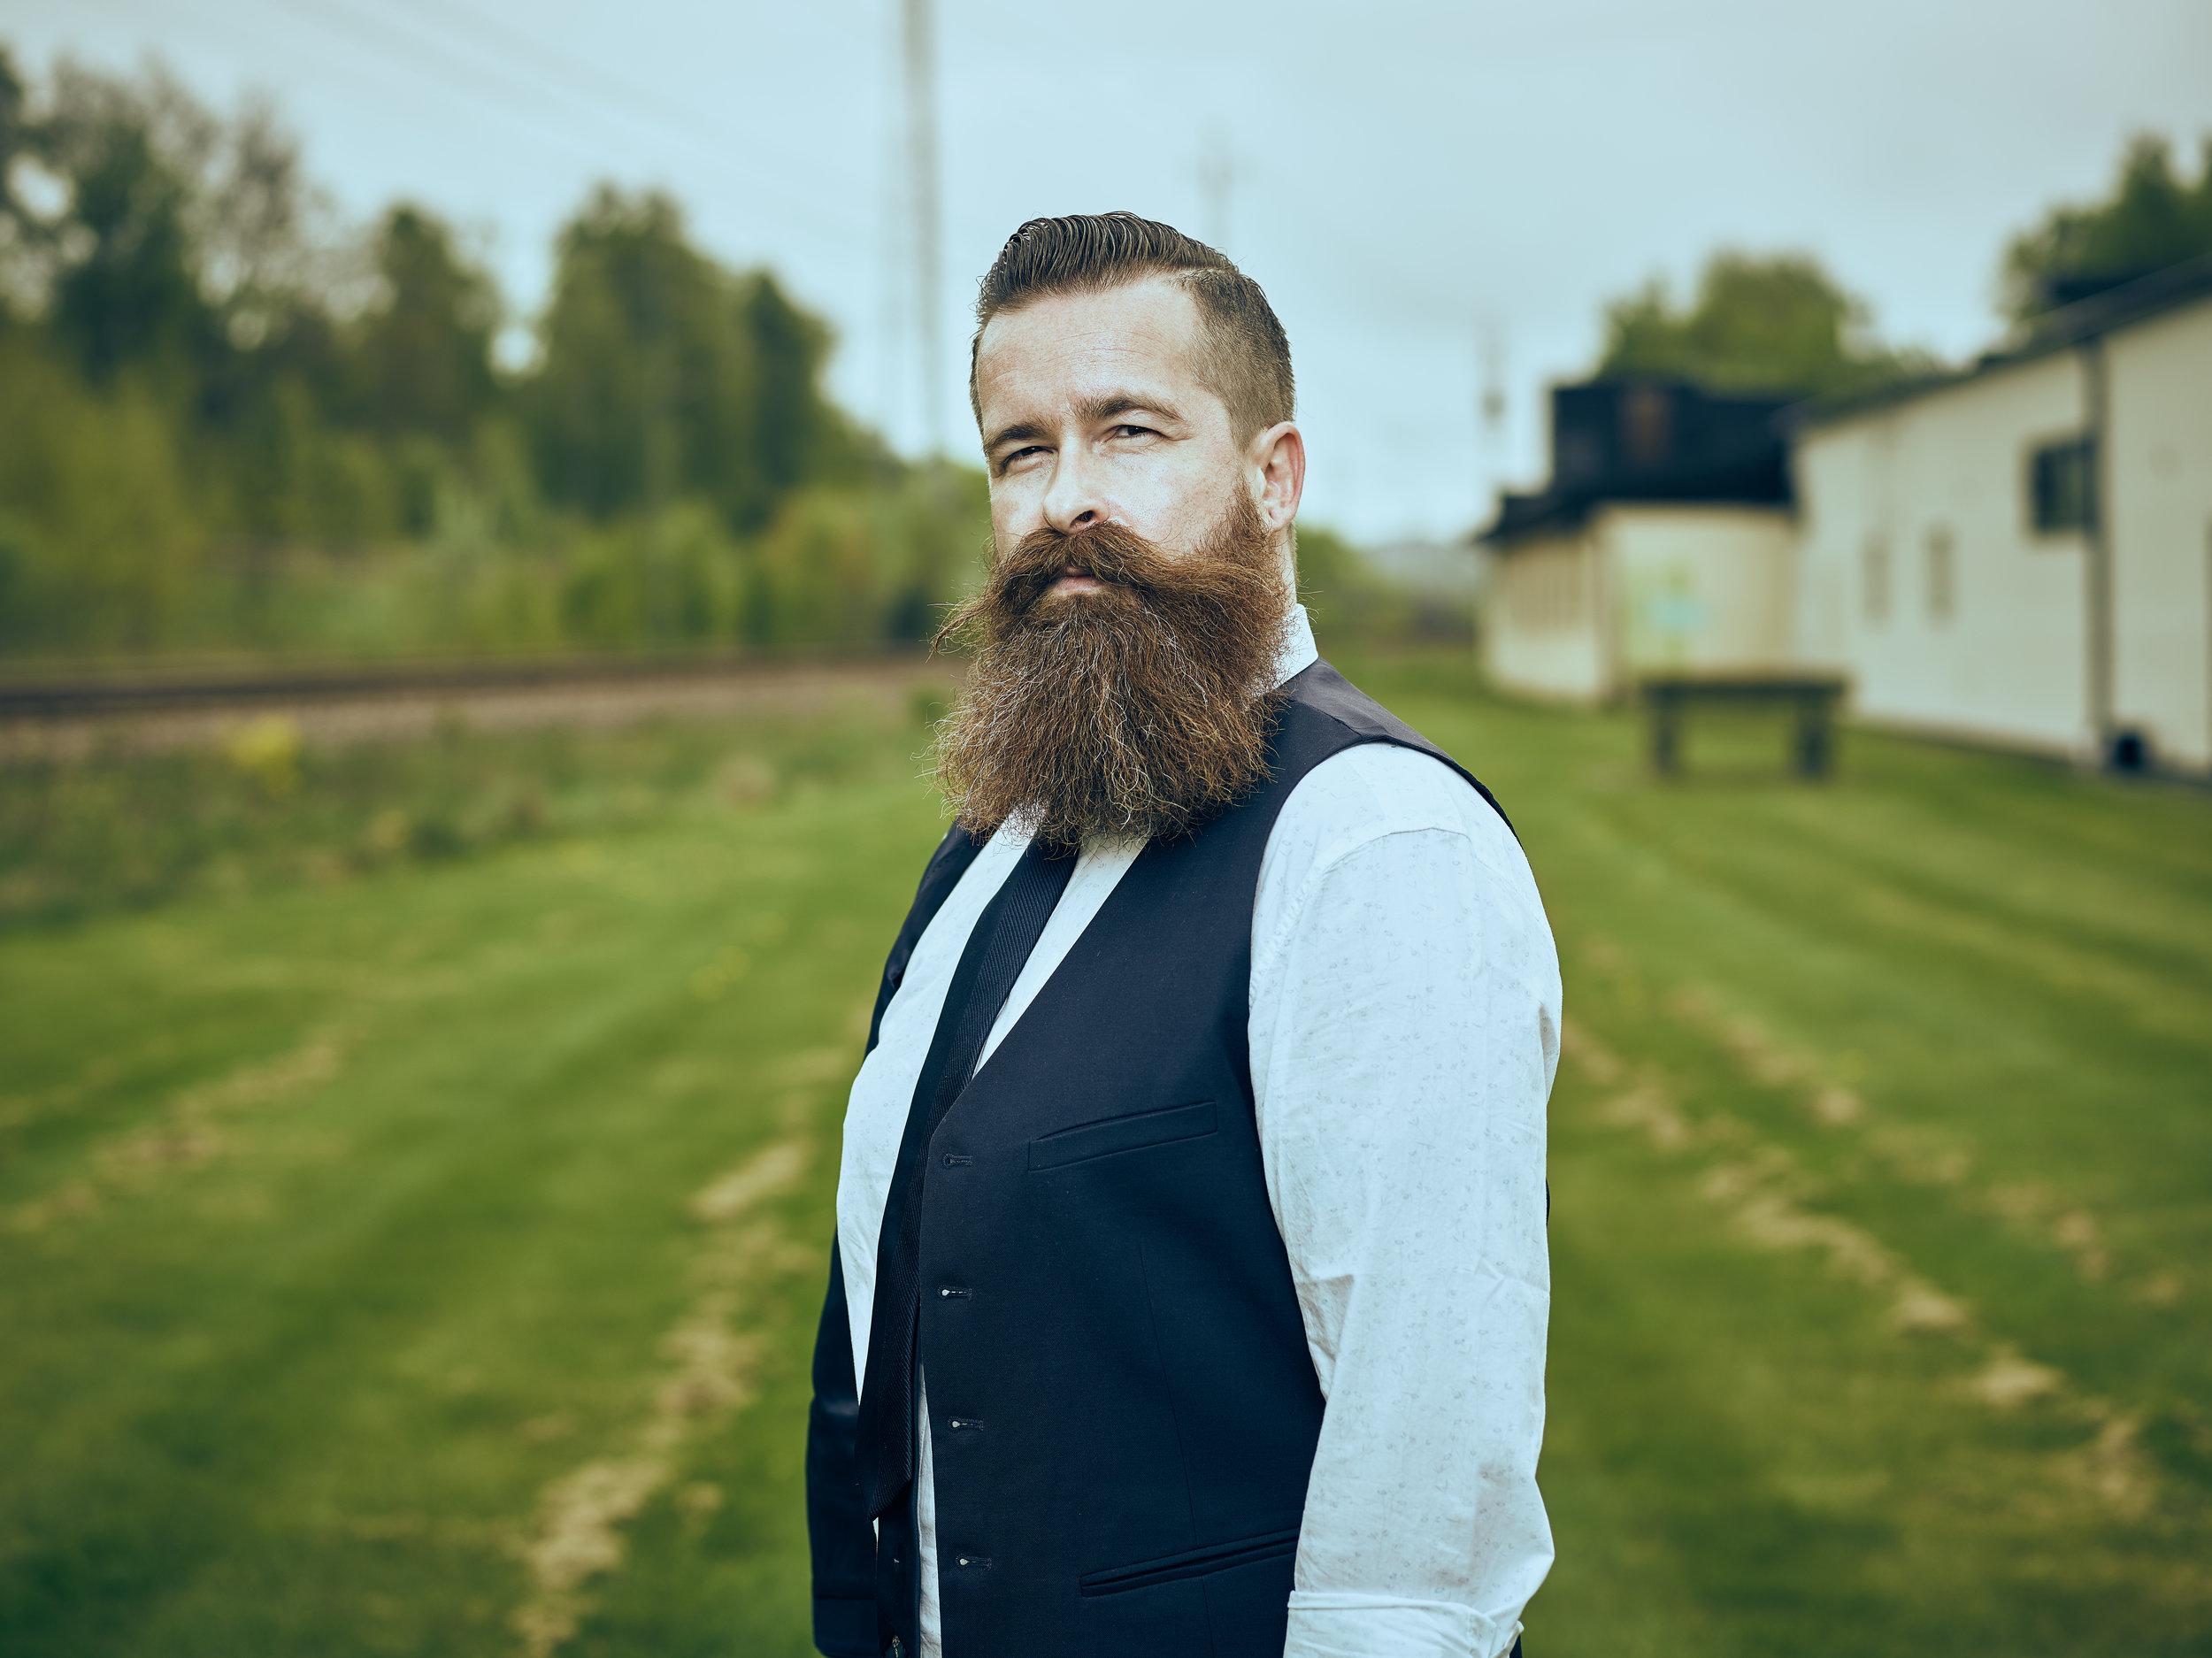 Beard_Portfolio_CF000811.jpg